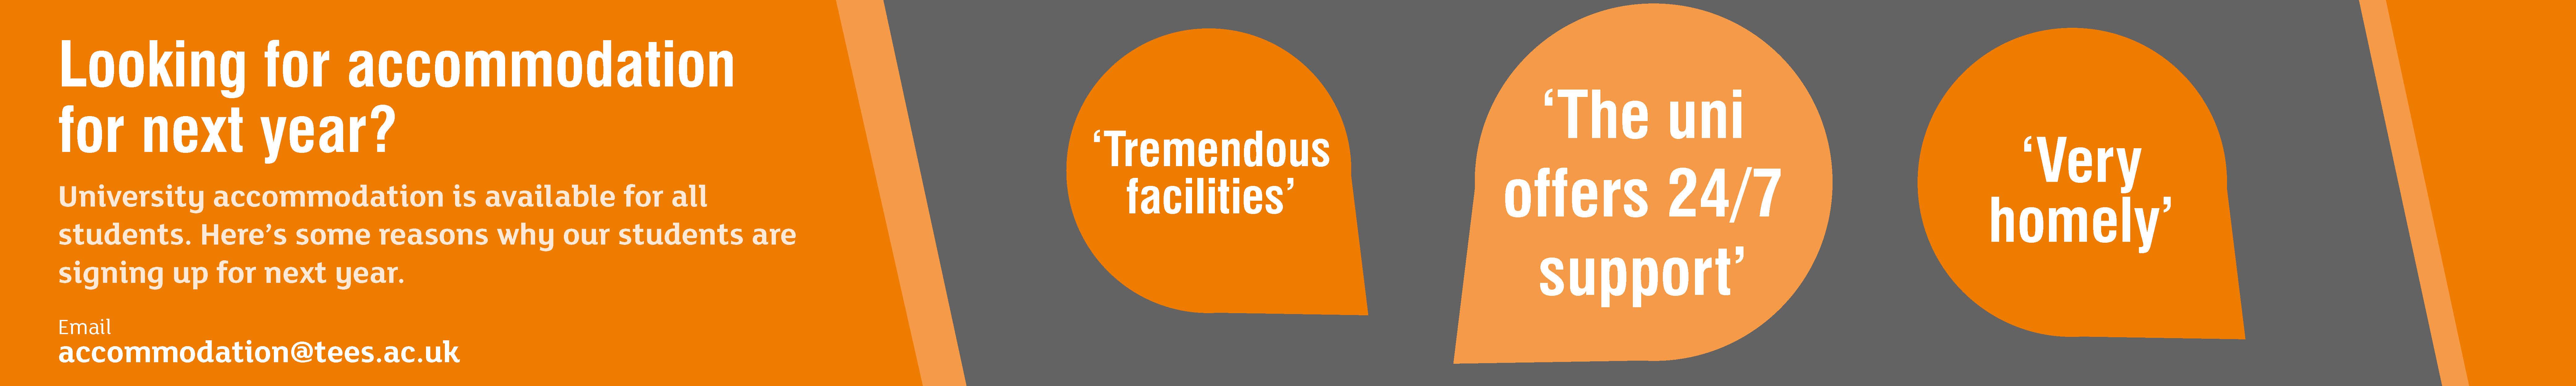 Tu accommodation web banner 2021 2